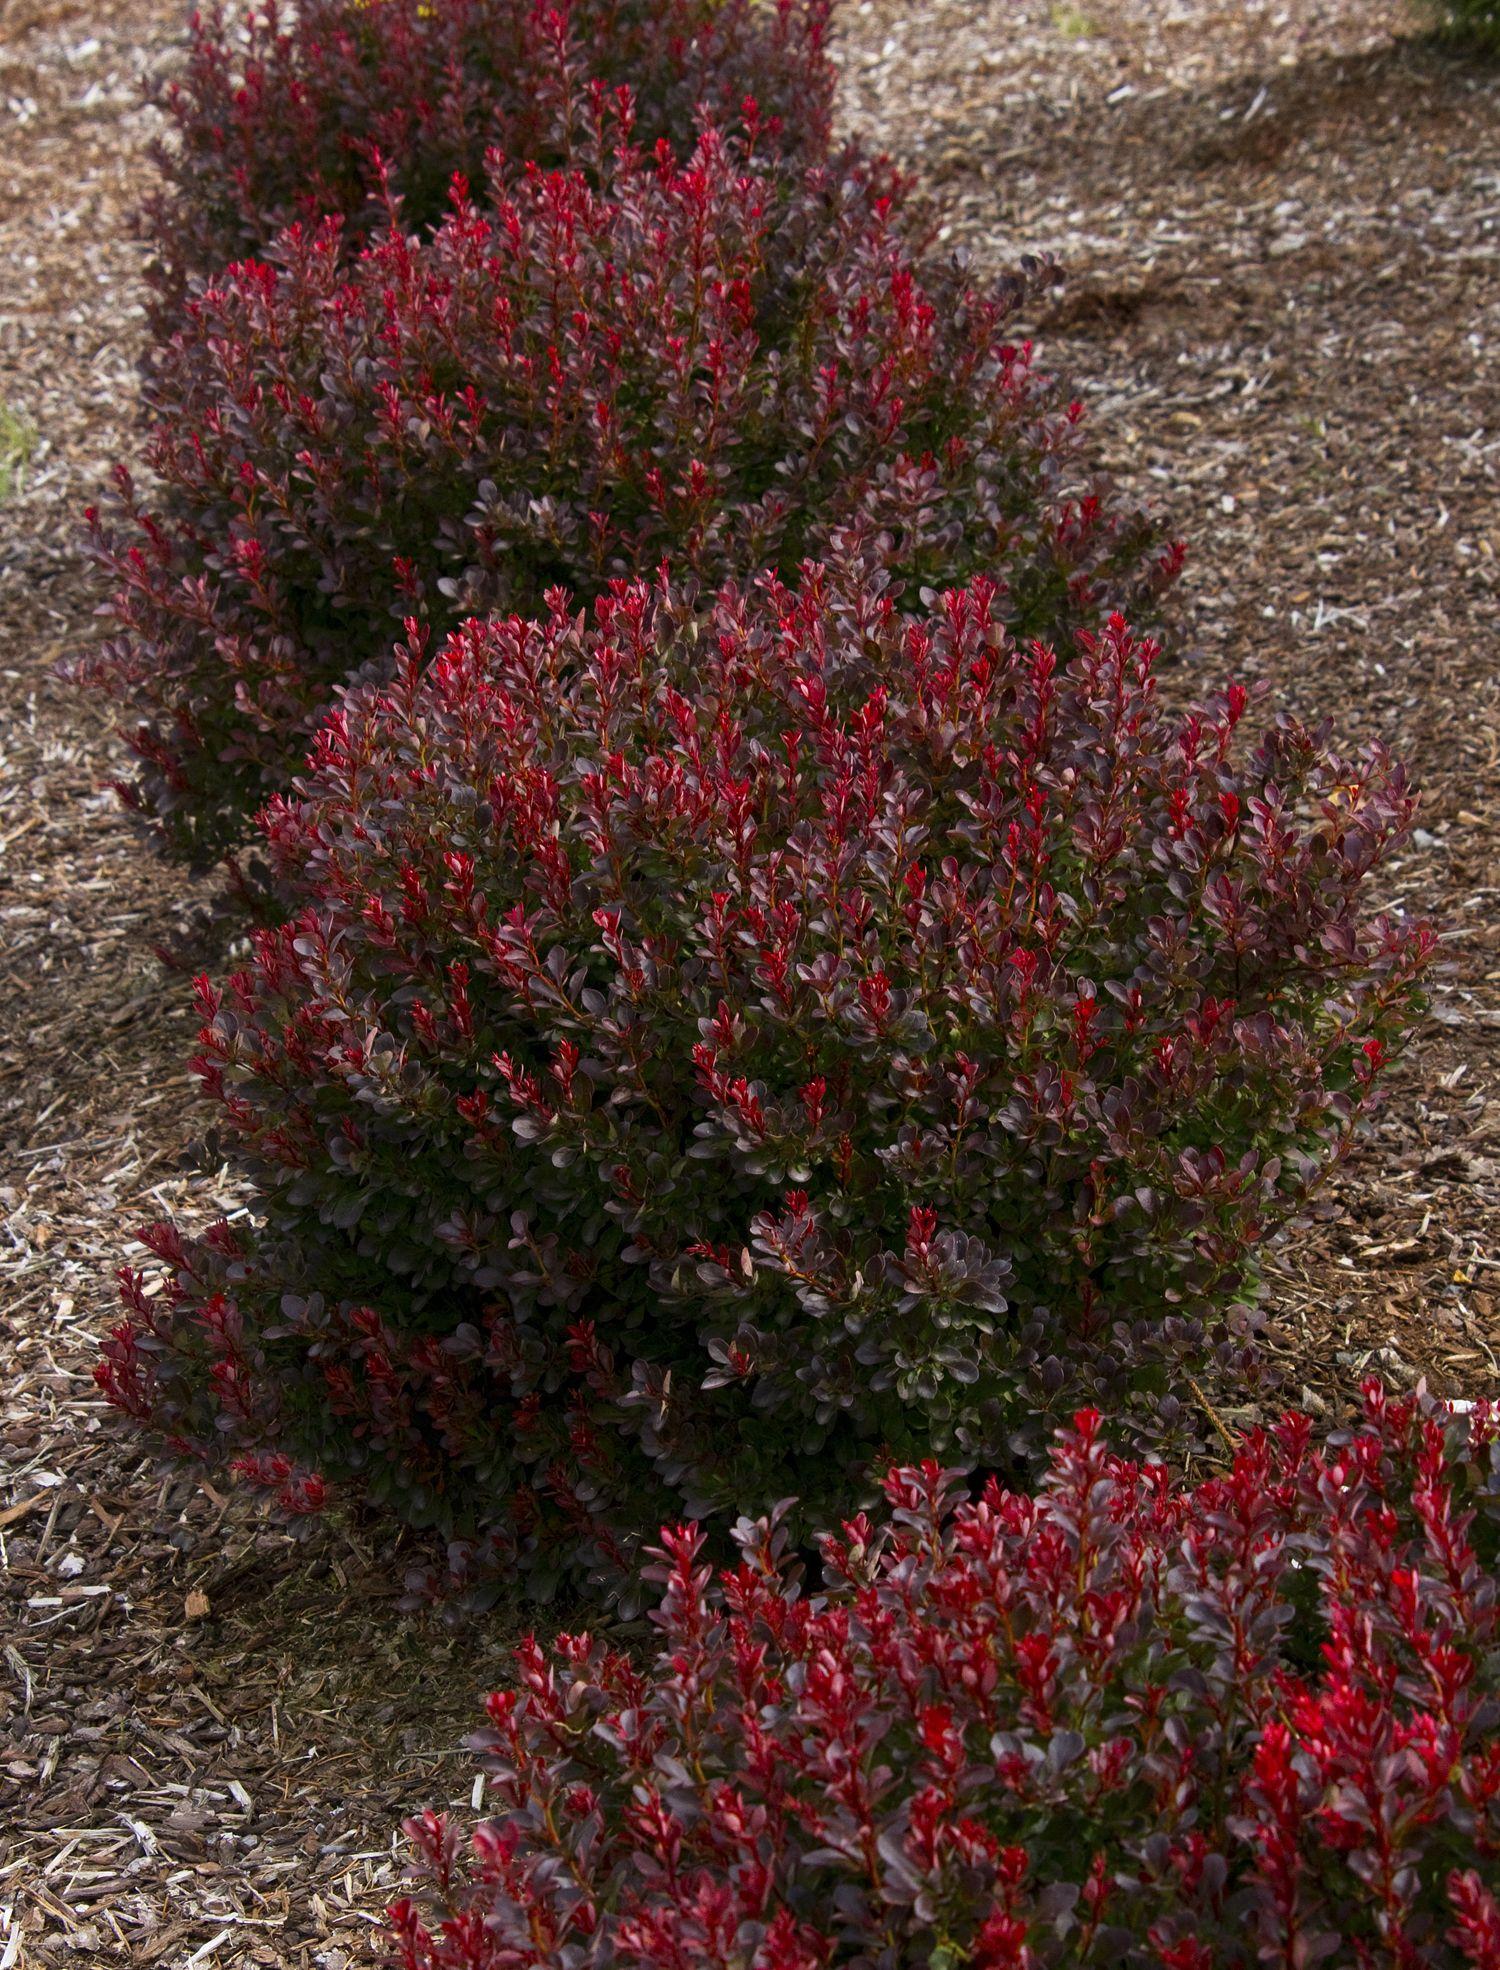 Dwarf Perennial Bushes Red Leaves